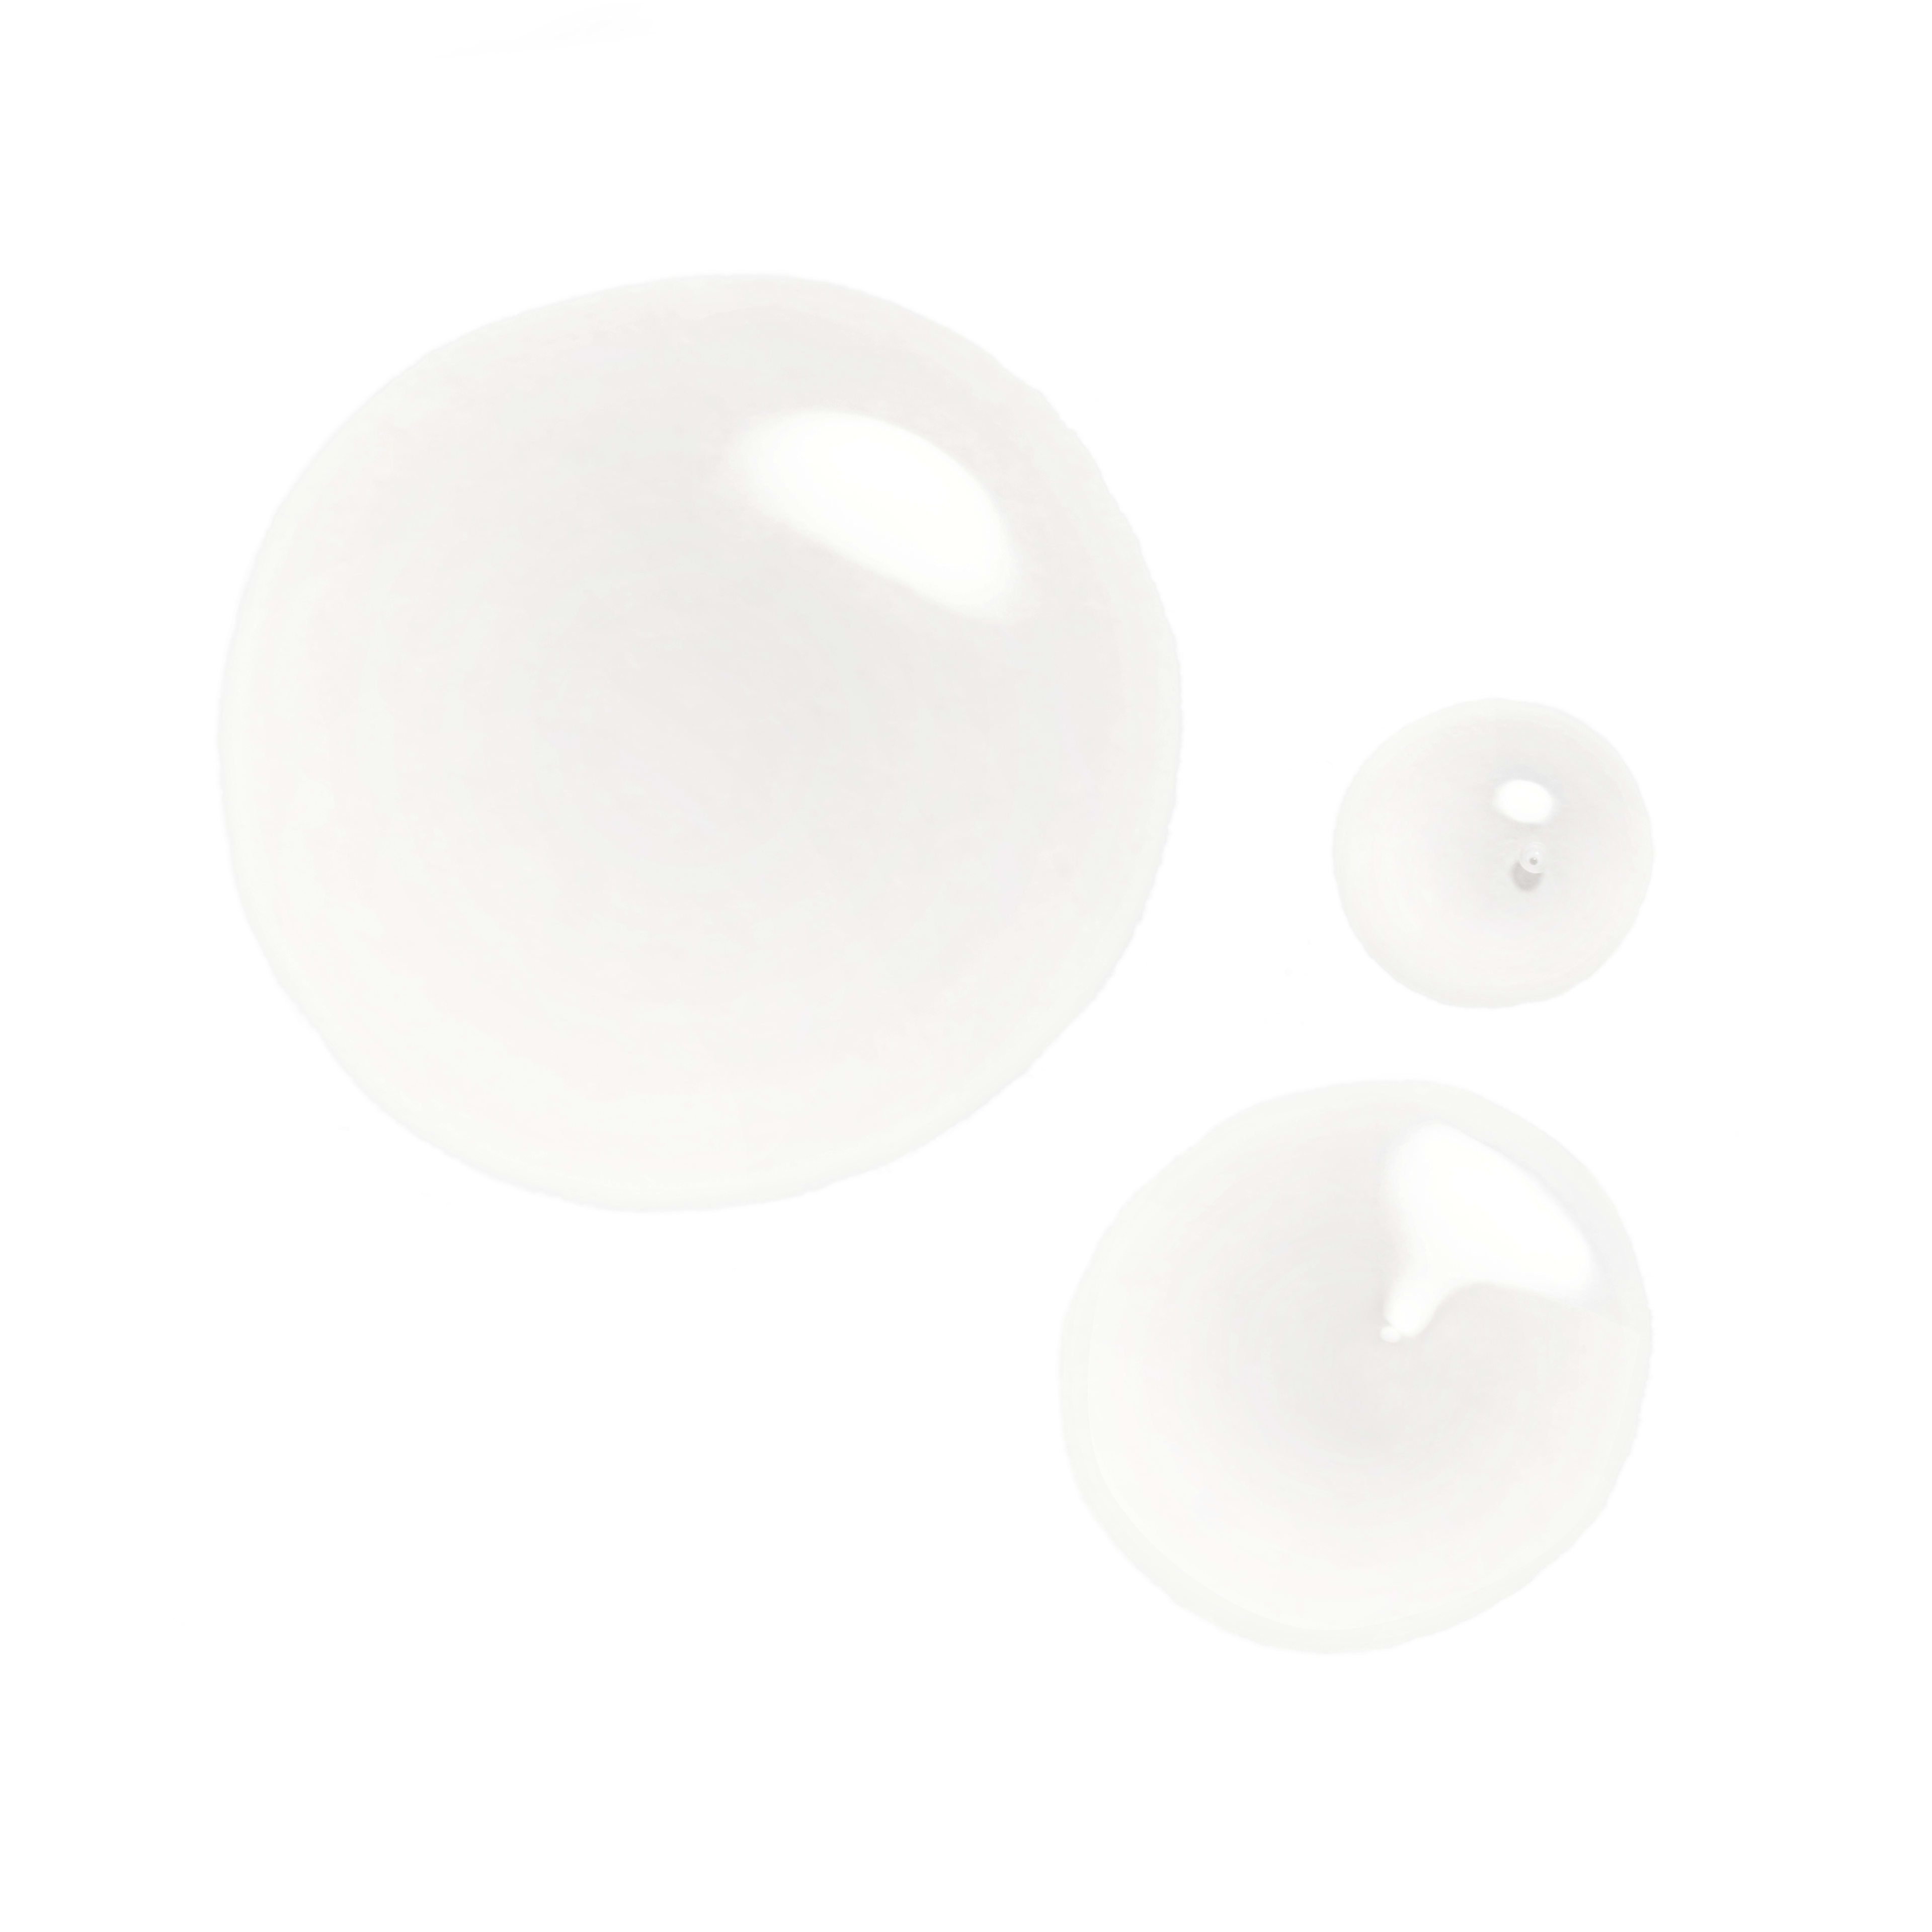 LE BLANC HUILE - skincare - 1.7FL. OZ. - Basic texture view